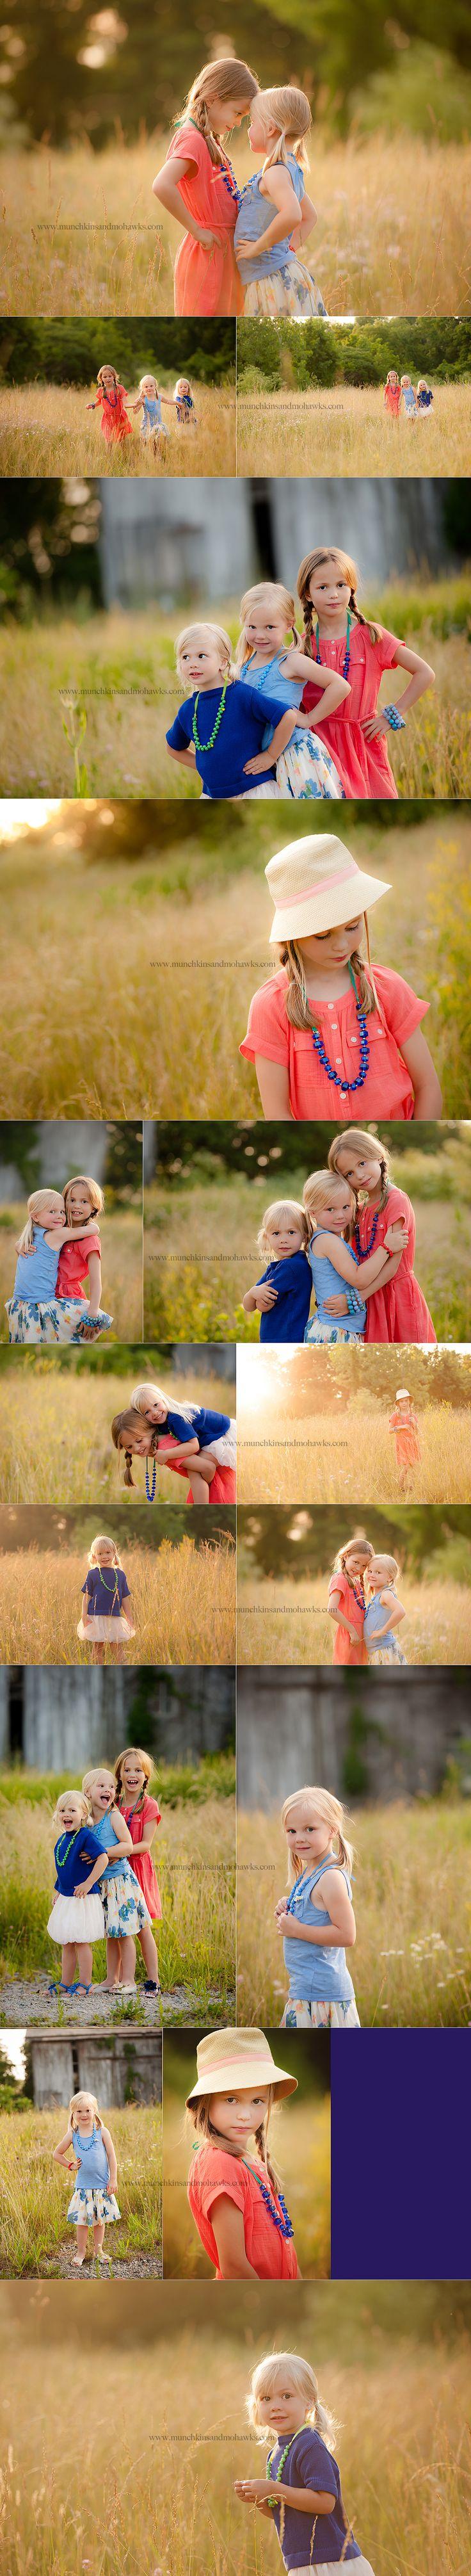 three little girl sisters www.munchkinsandmohawks.com/blog